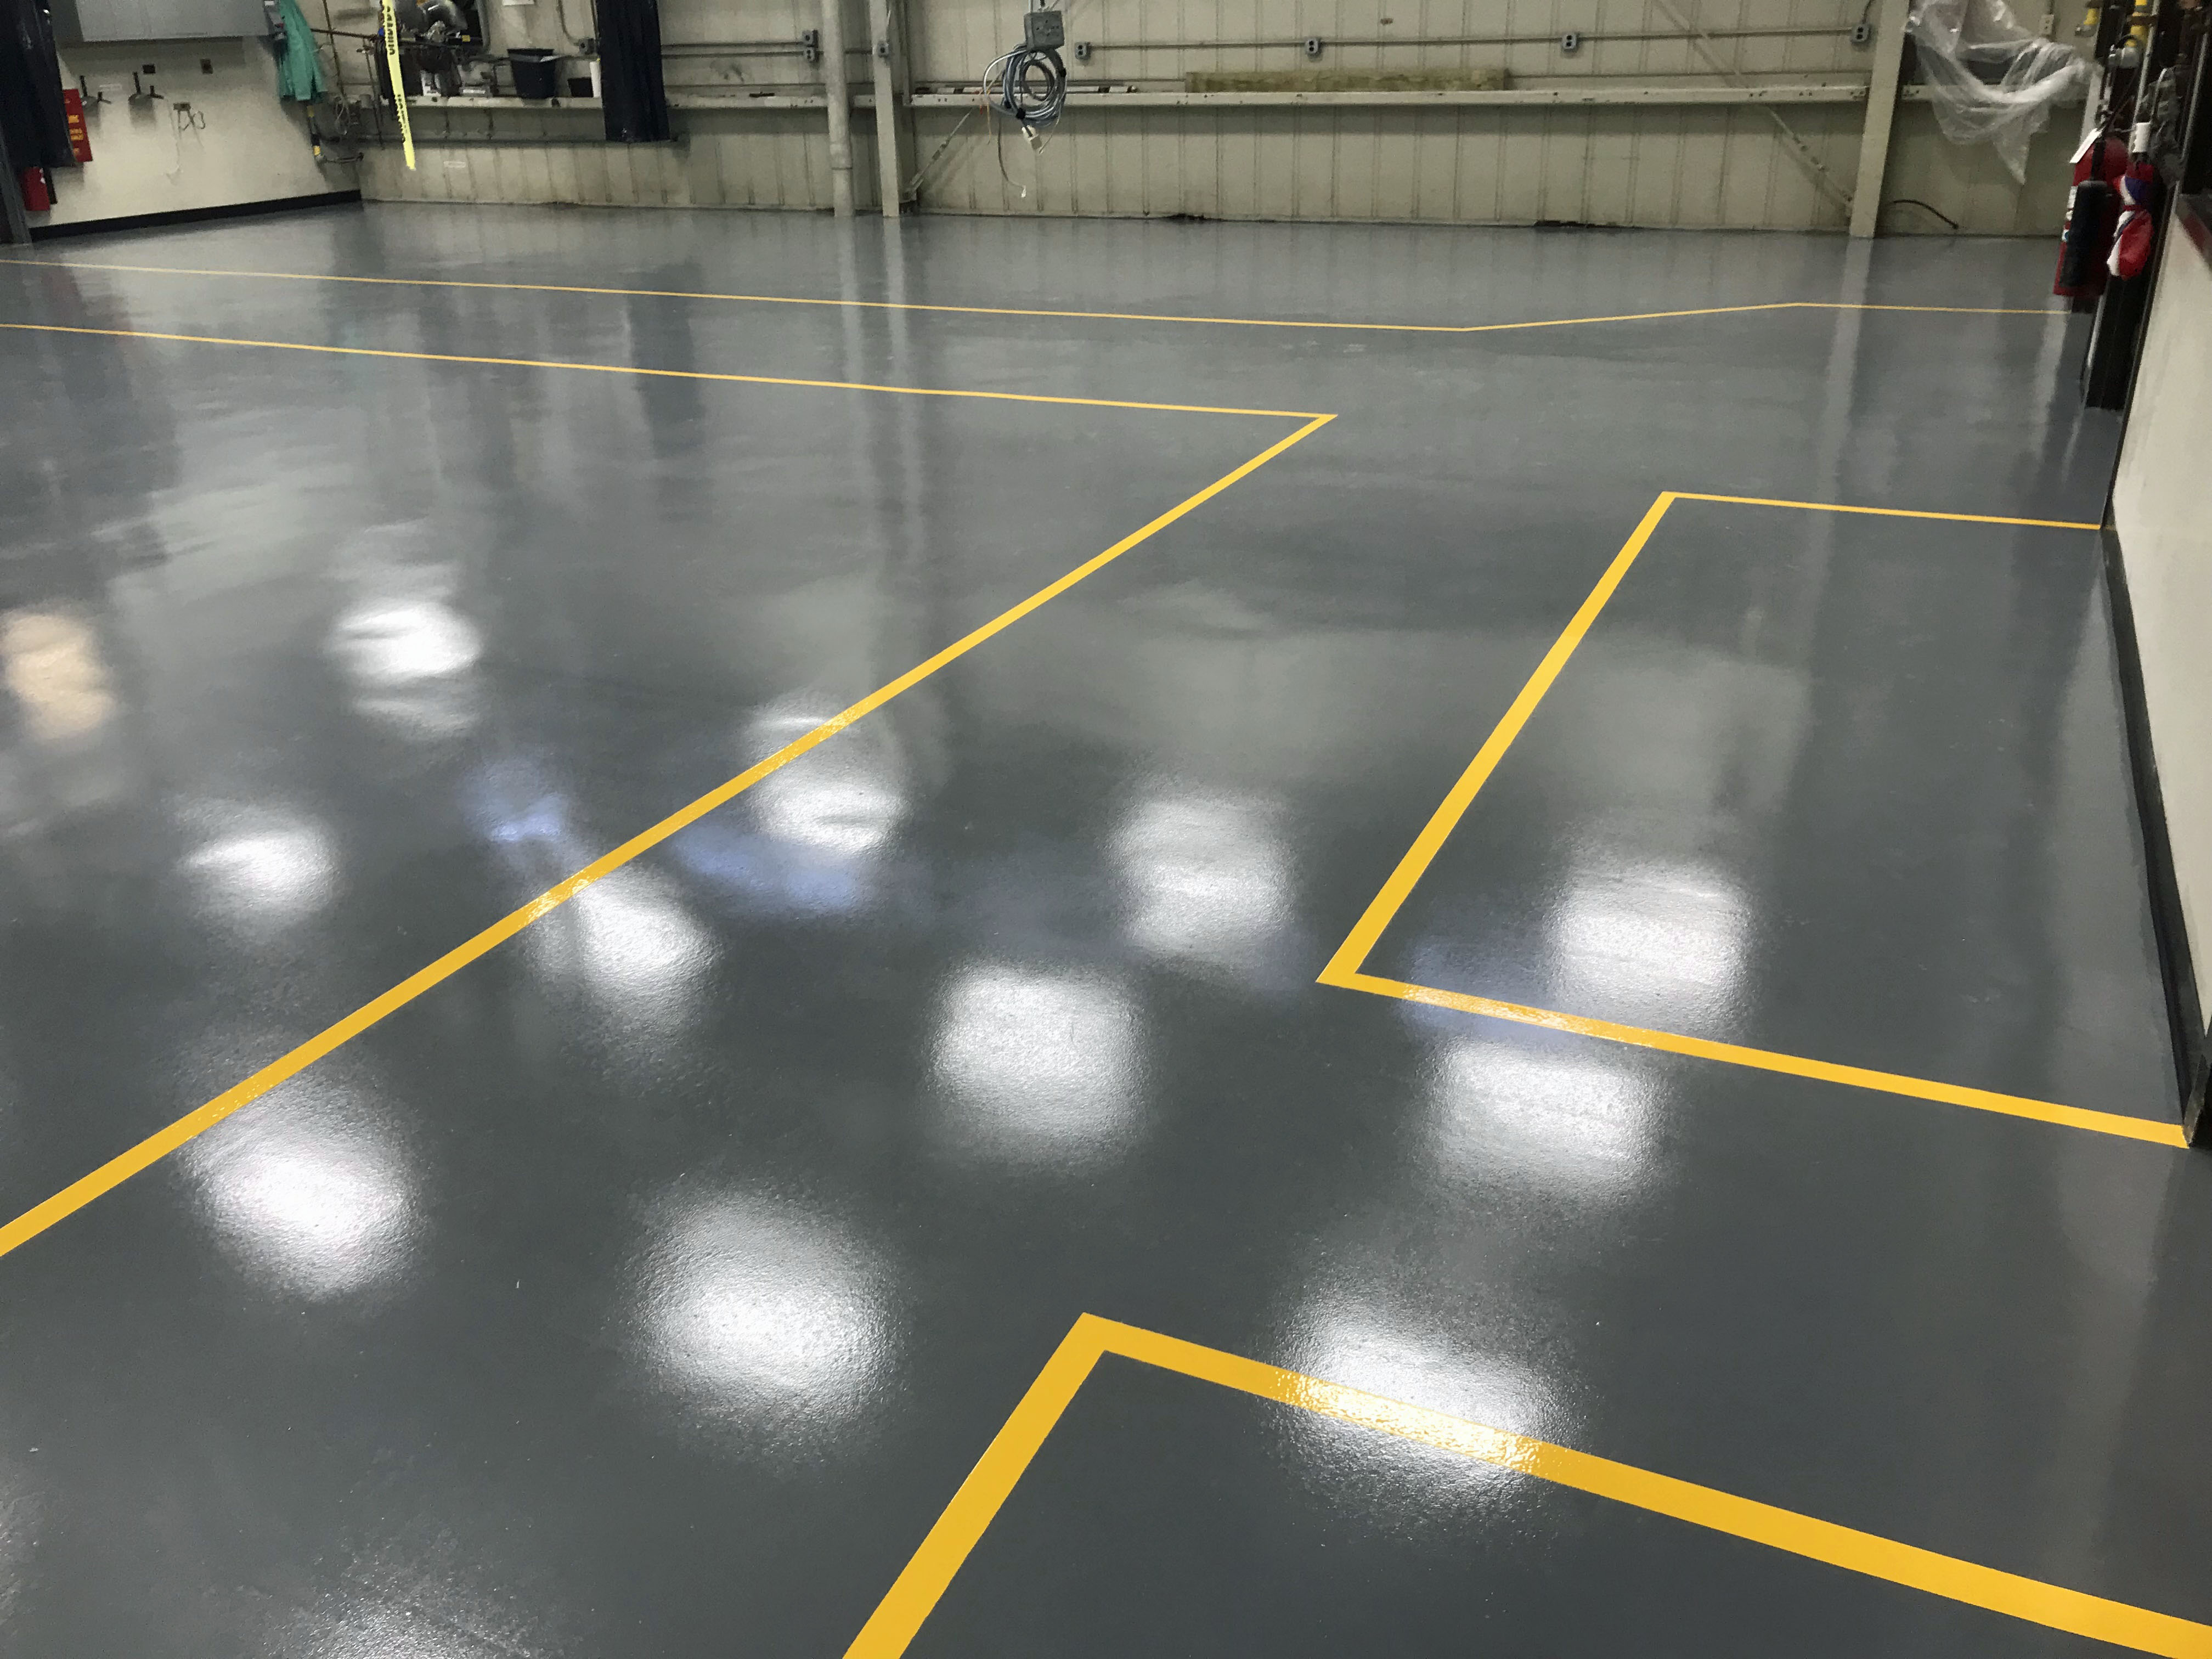 Benefits Of Epoxy Floor Coatings In Basements Garages And Other